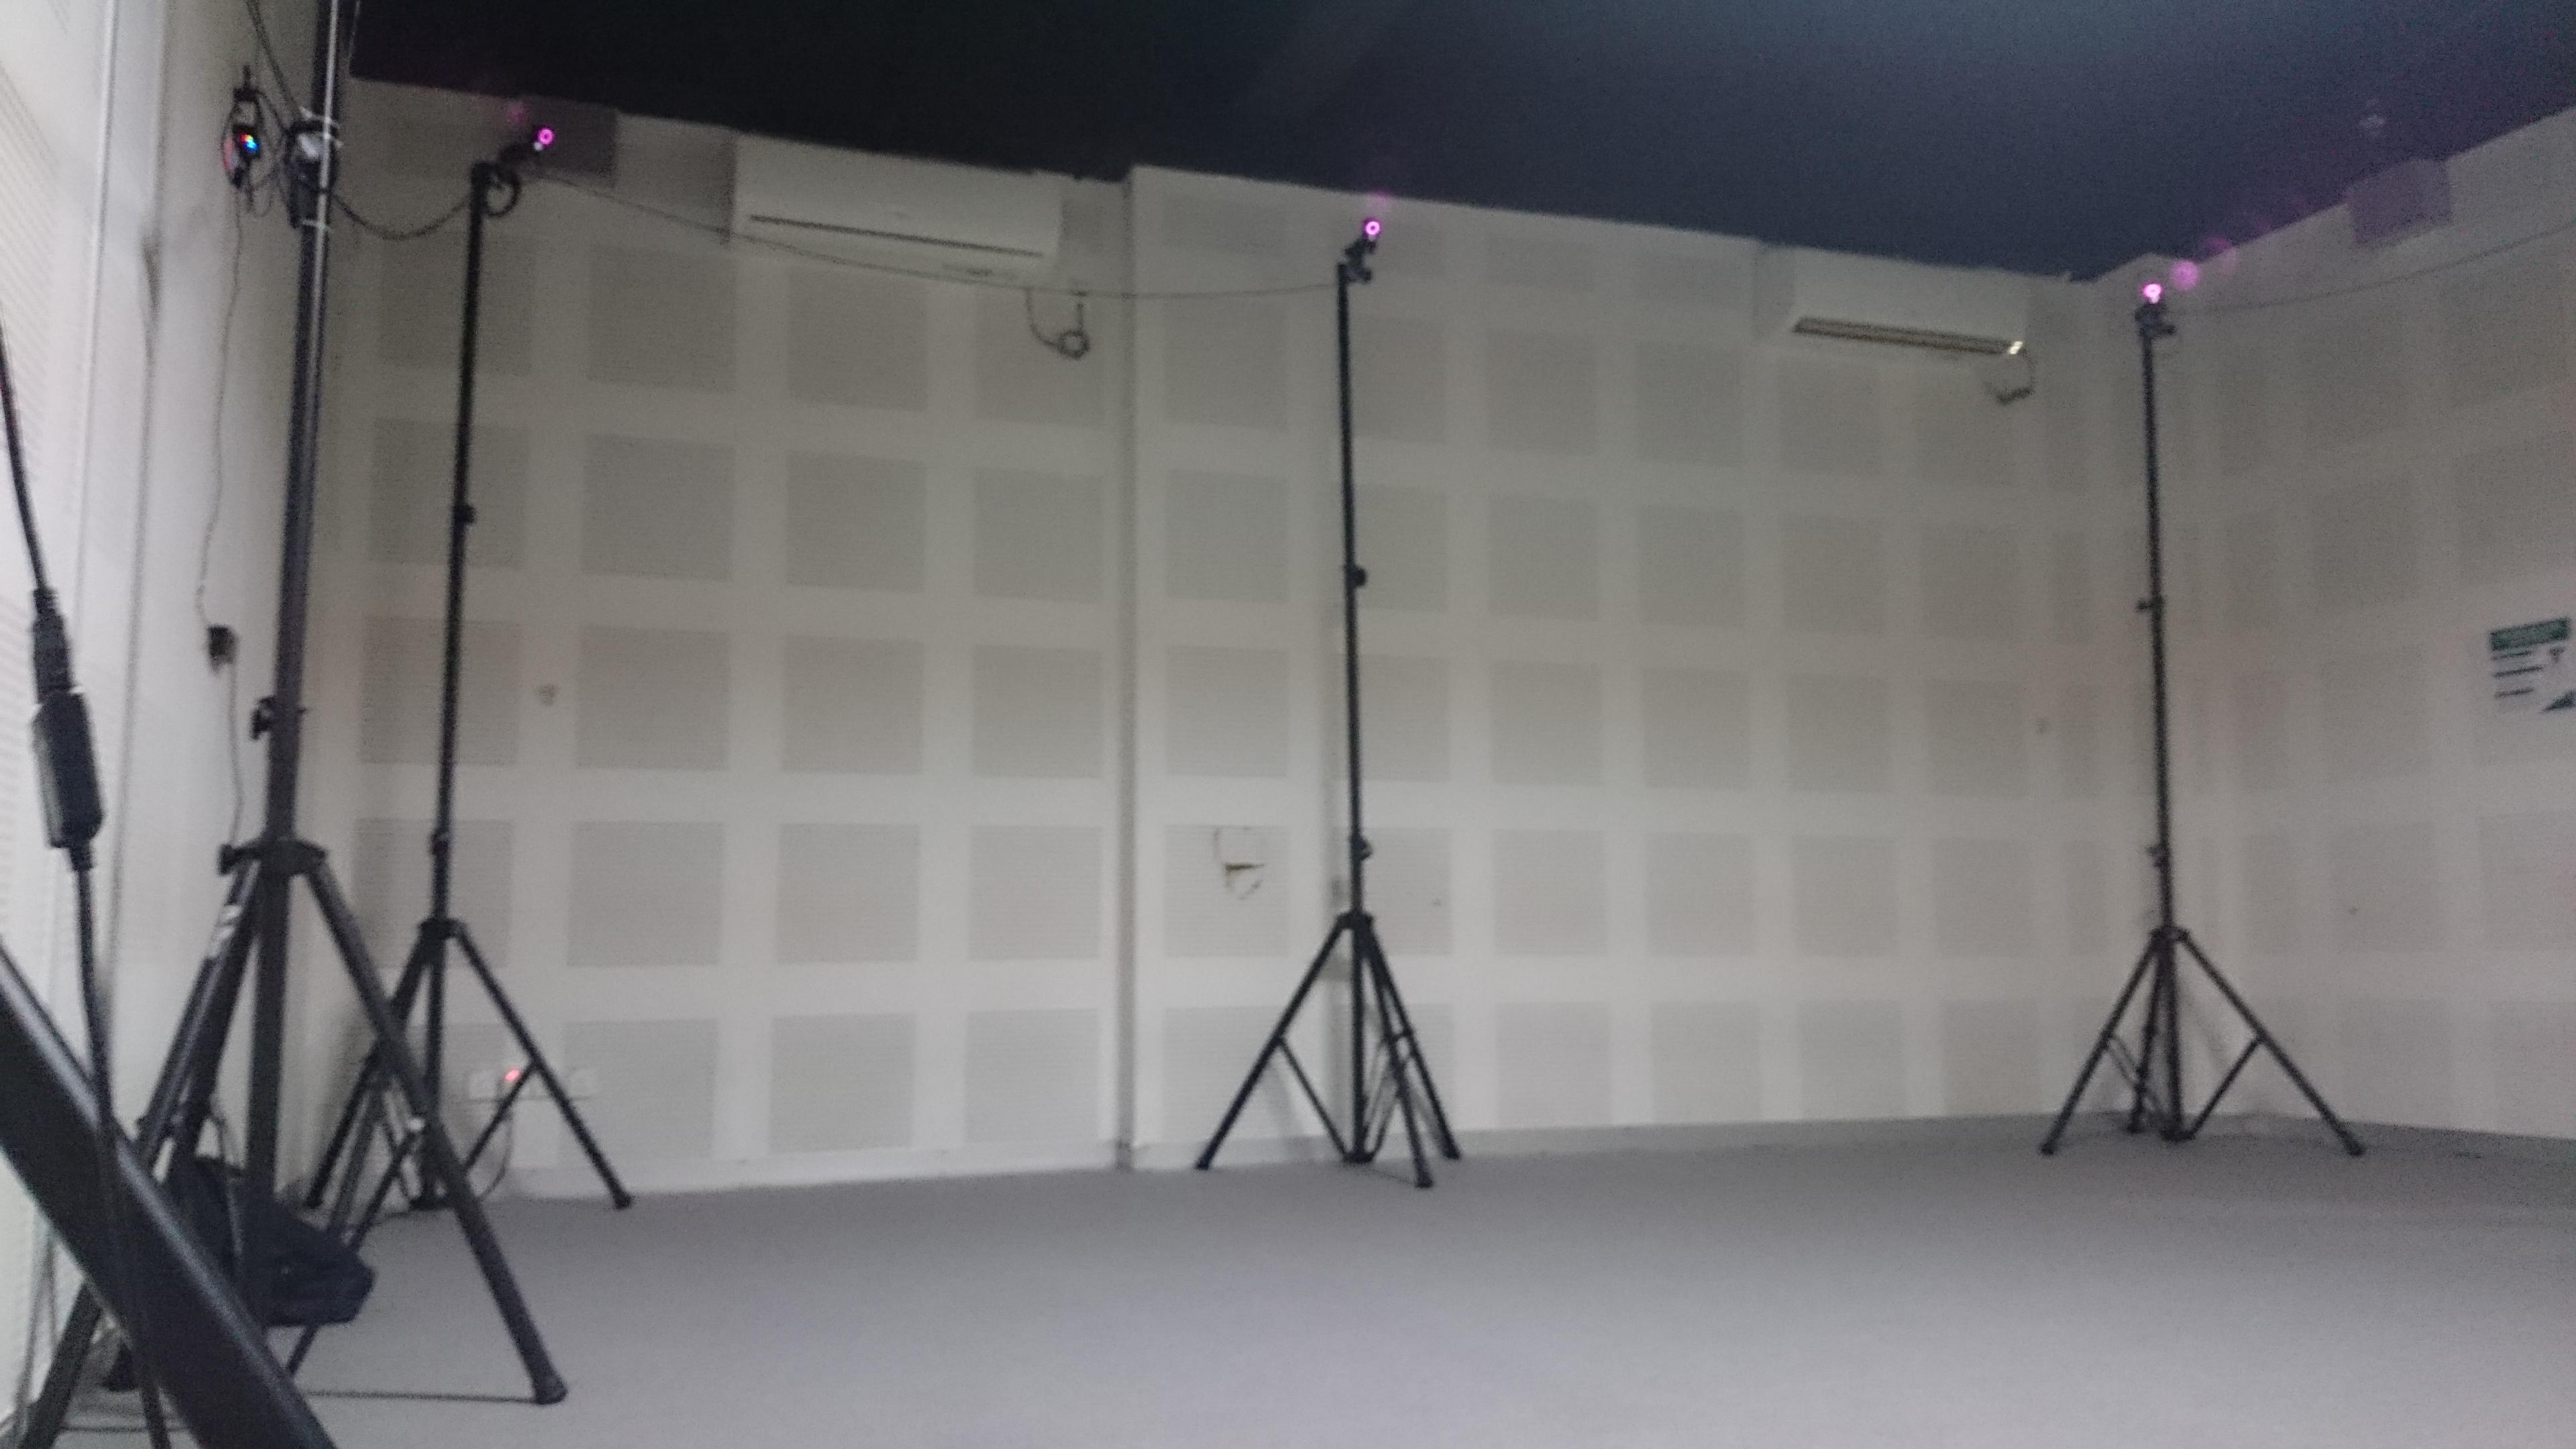 Keadaan di dalam laboratorium motion capture Polibatam